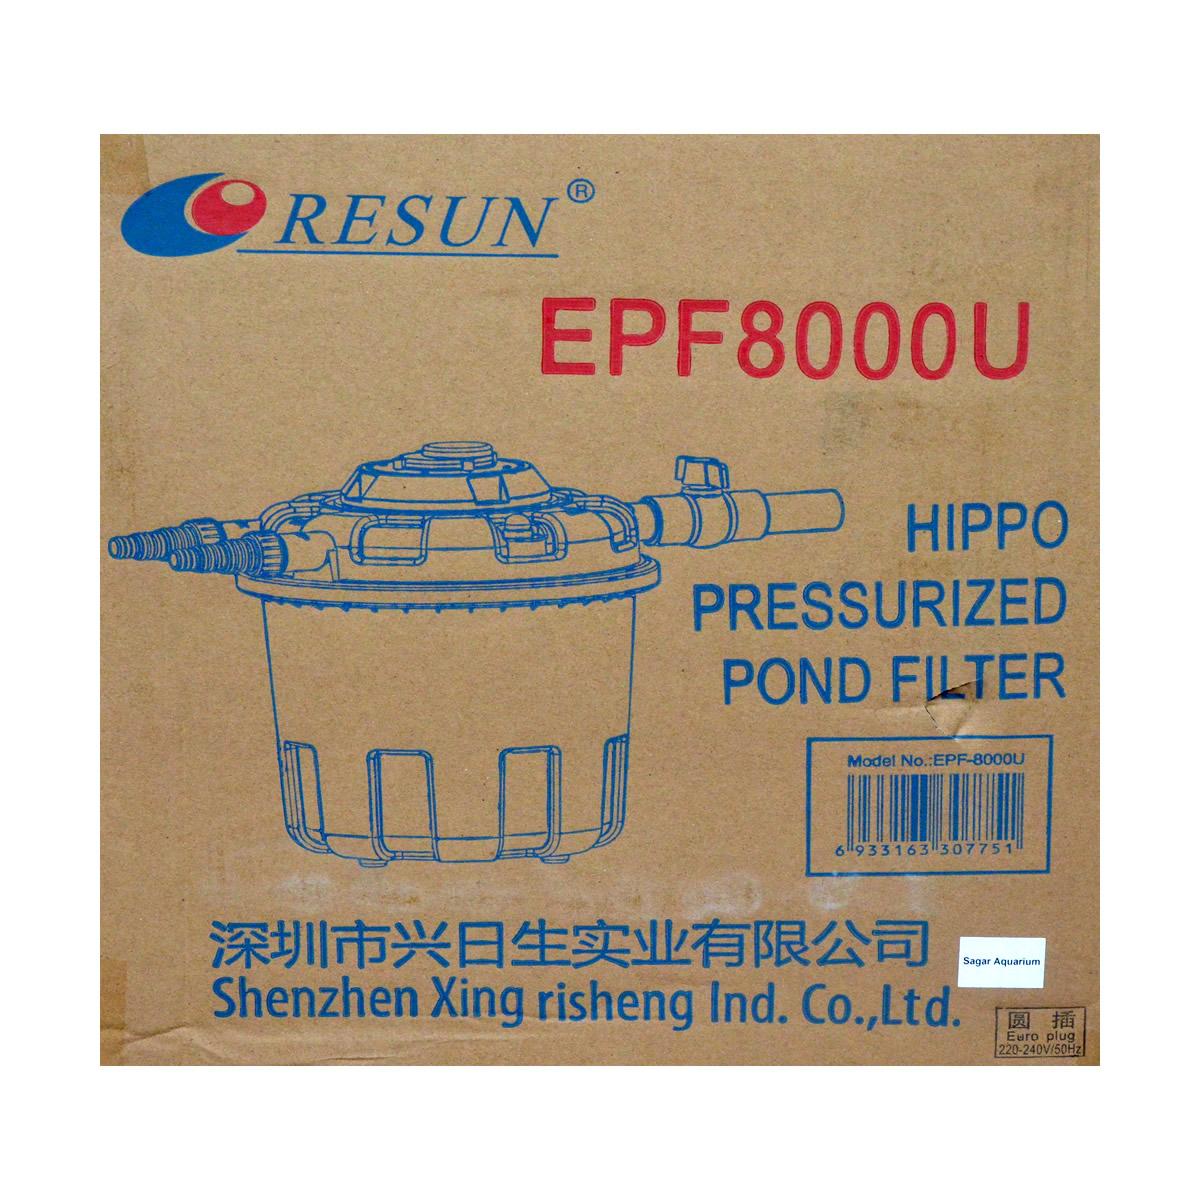 ReSun EPF8000U Hippo Pressurized Pond Filter With 13W UV 20L 8000-16000L